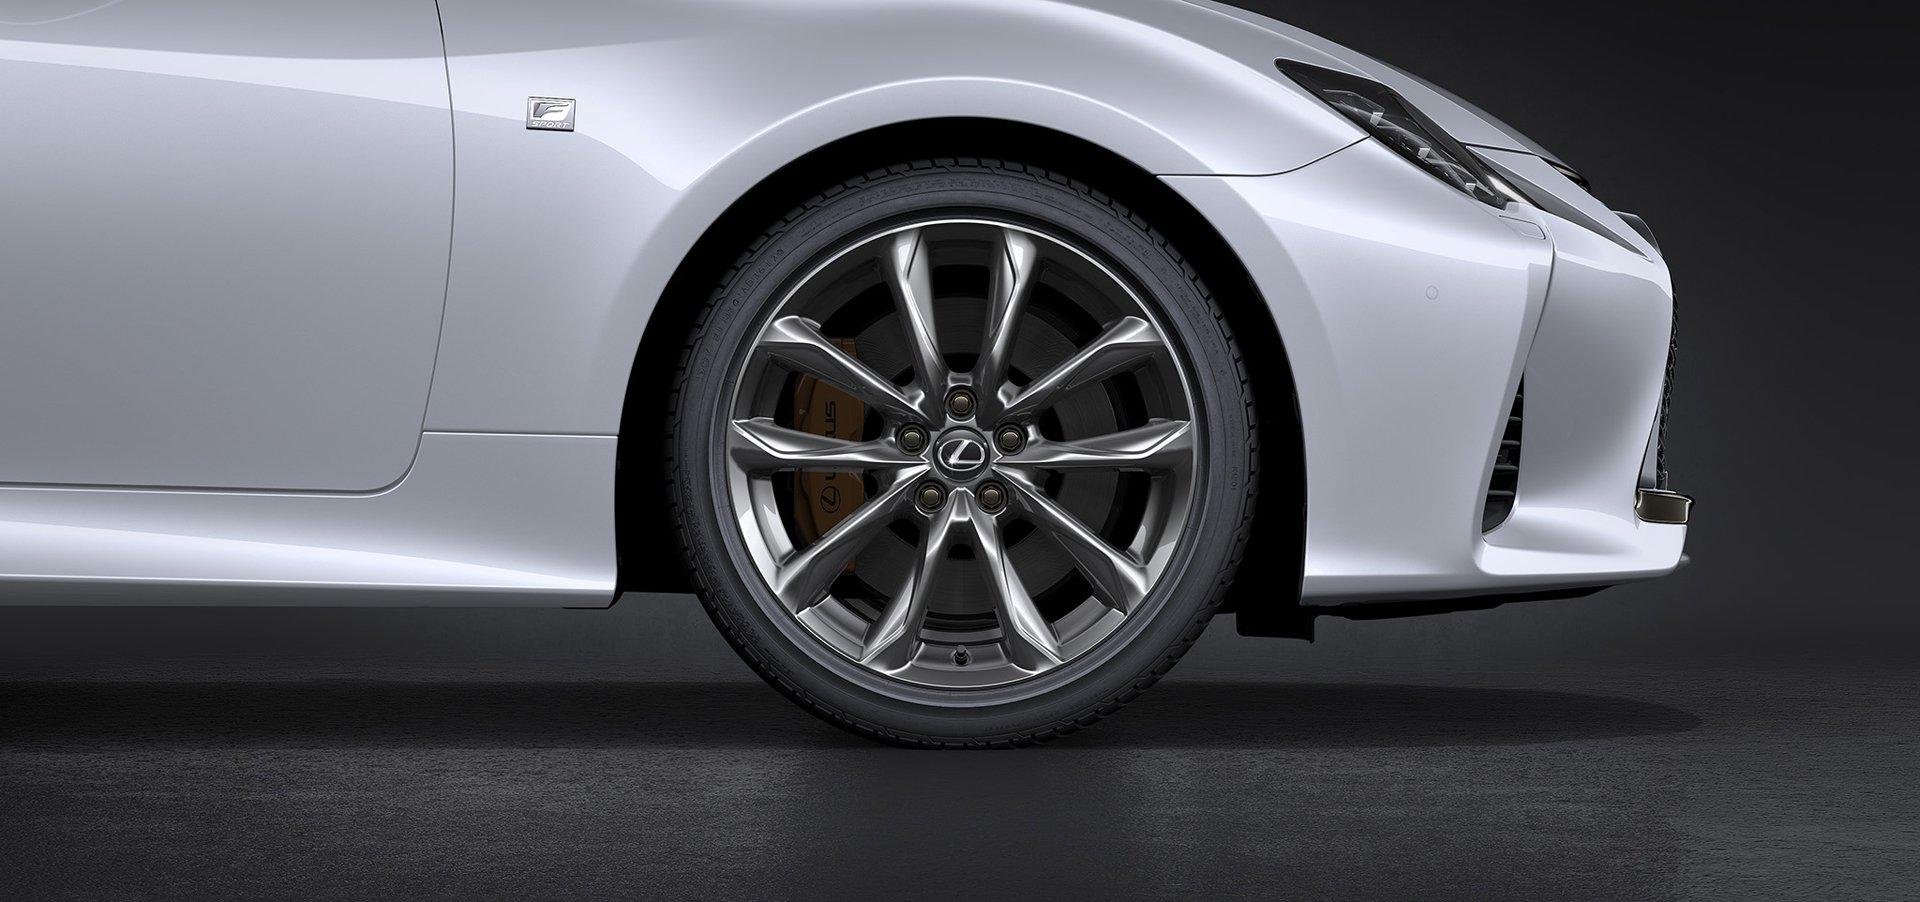 Lexus RC facelift 2019 (12)